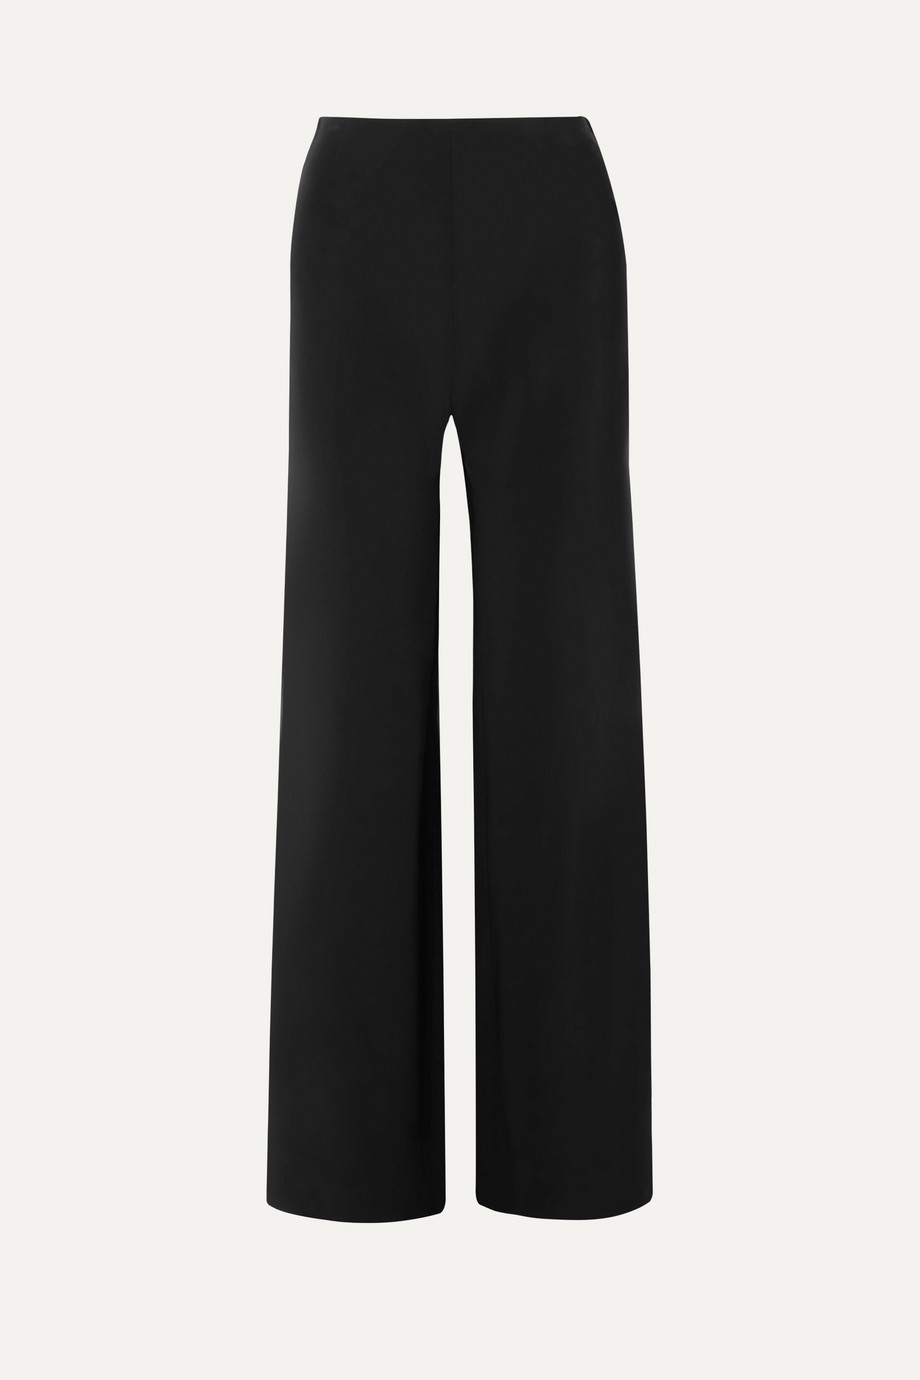 Rosetta Getty Twill wide-leg pants